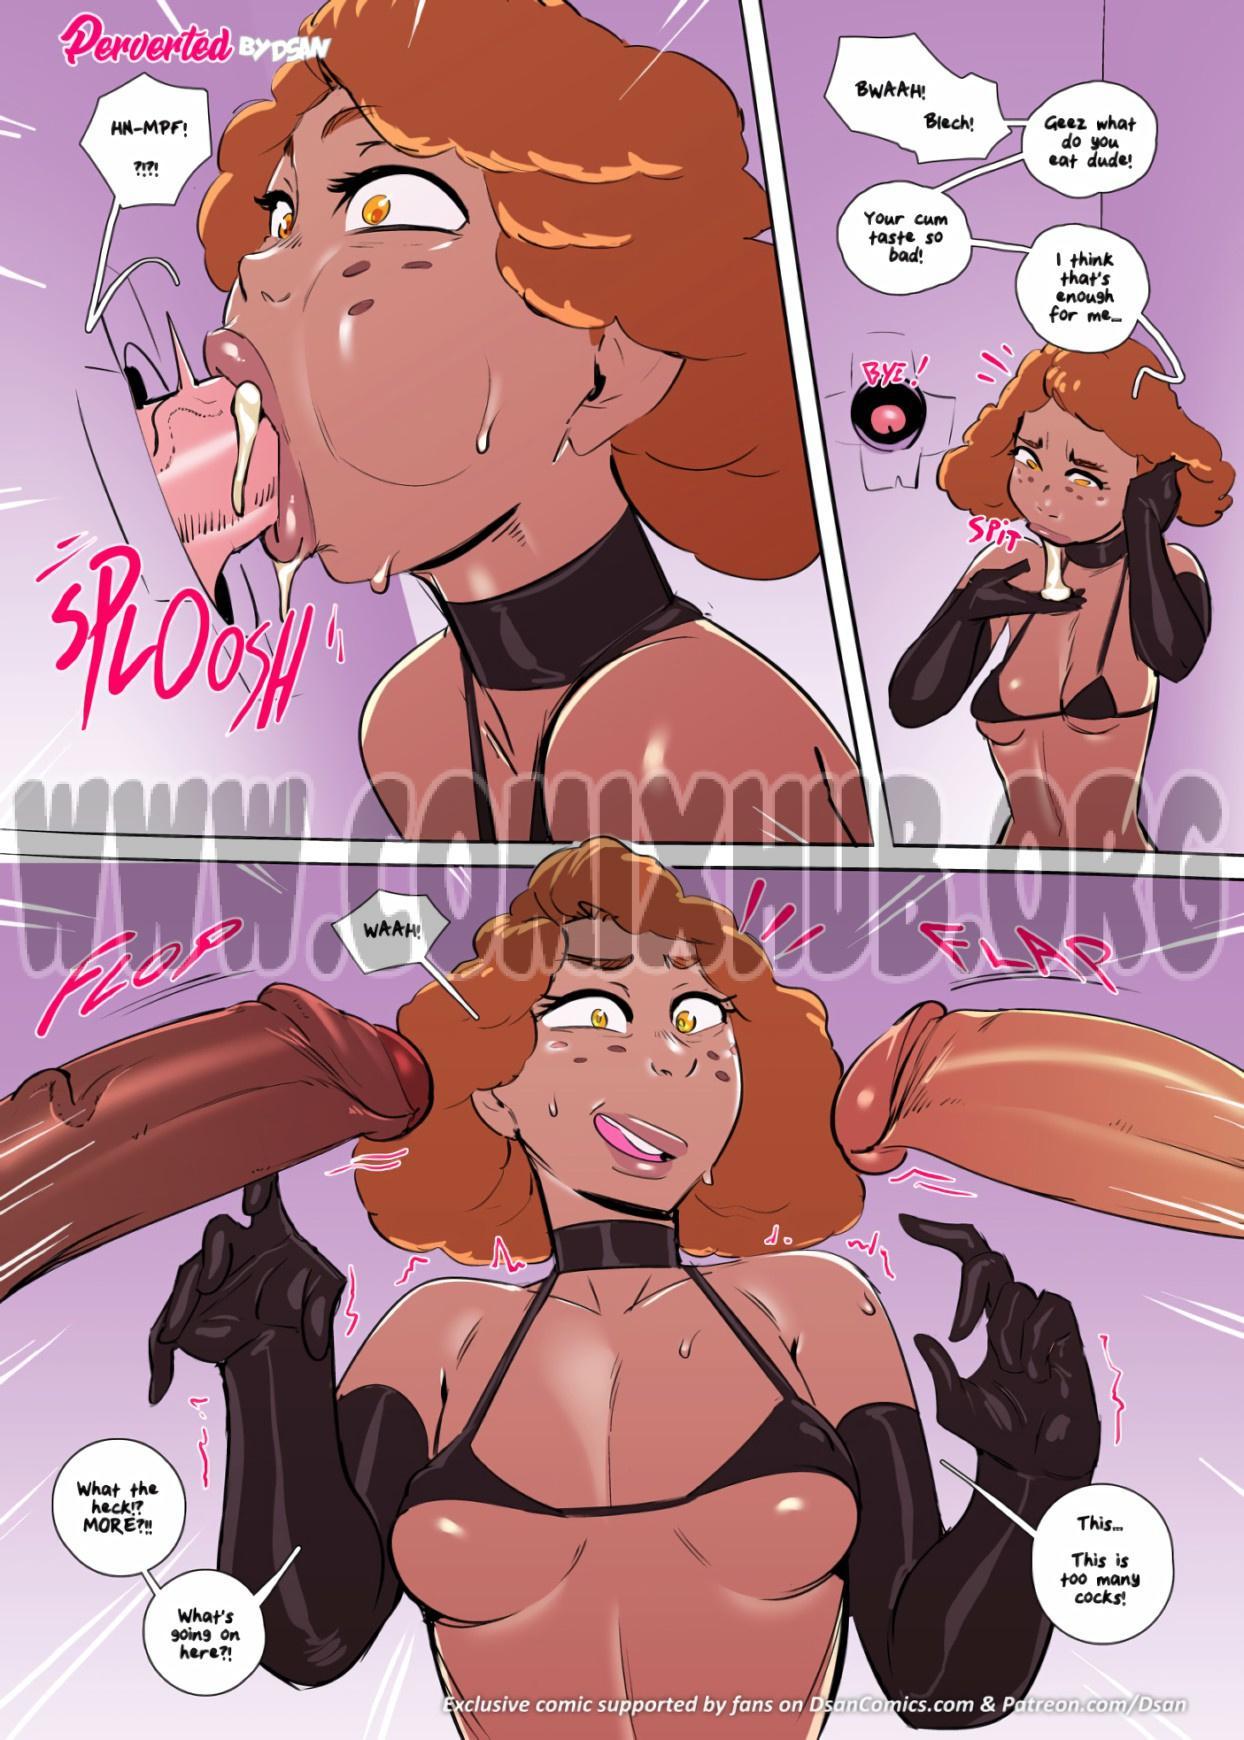 Perverted porn comics Oral sex, Anal Sex, Blowjob, Creampie, Cum Swallow, Deepthroat, Double Penetration, Gangbang, Latex, Masturbation, Stockings, Straight, Threesome, X-Ray